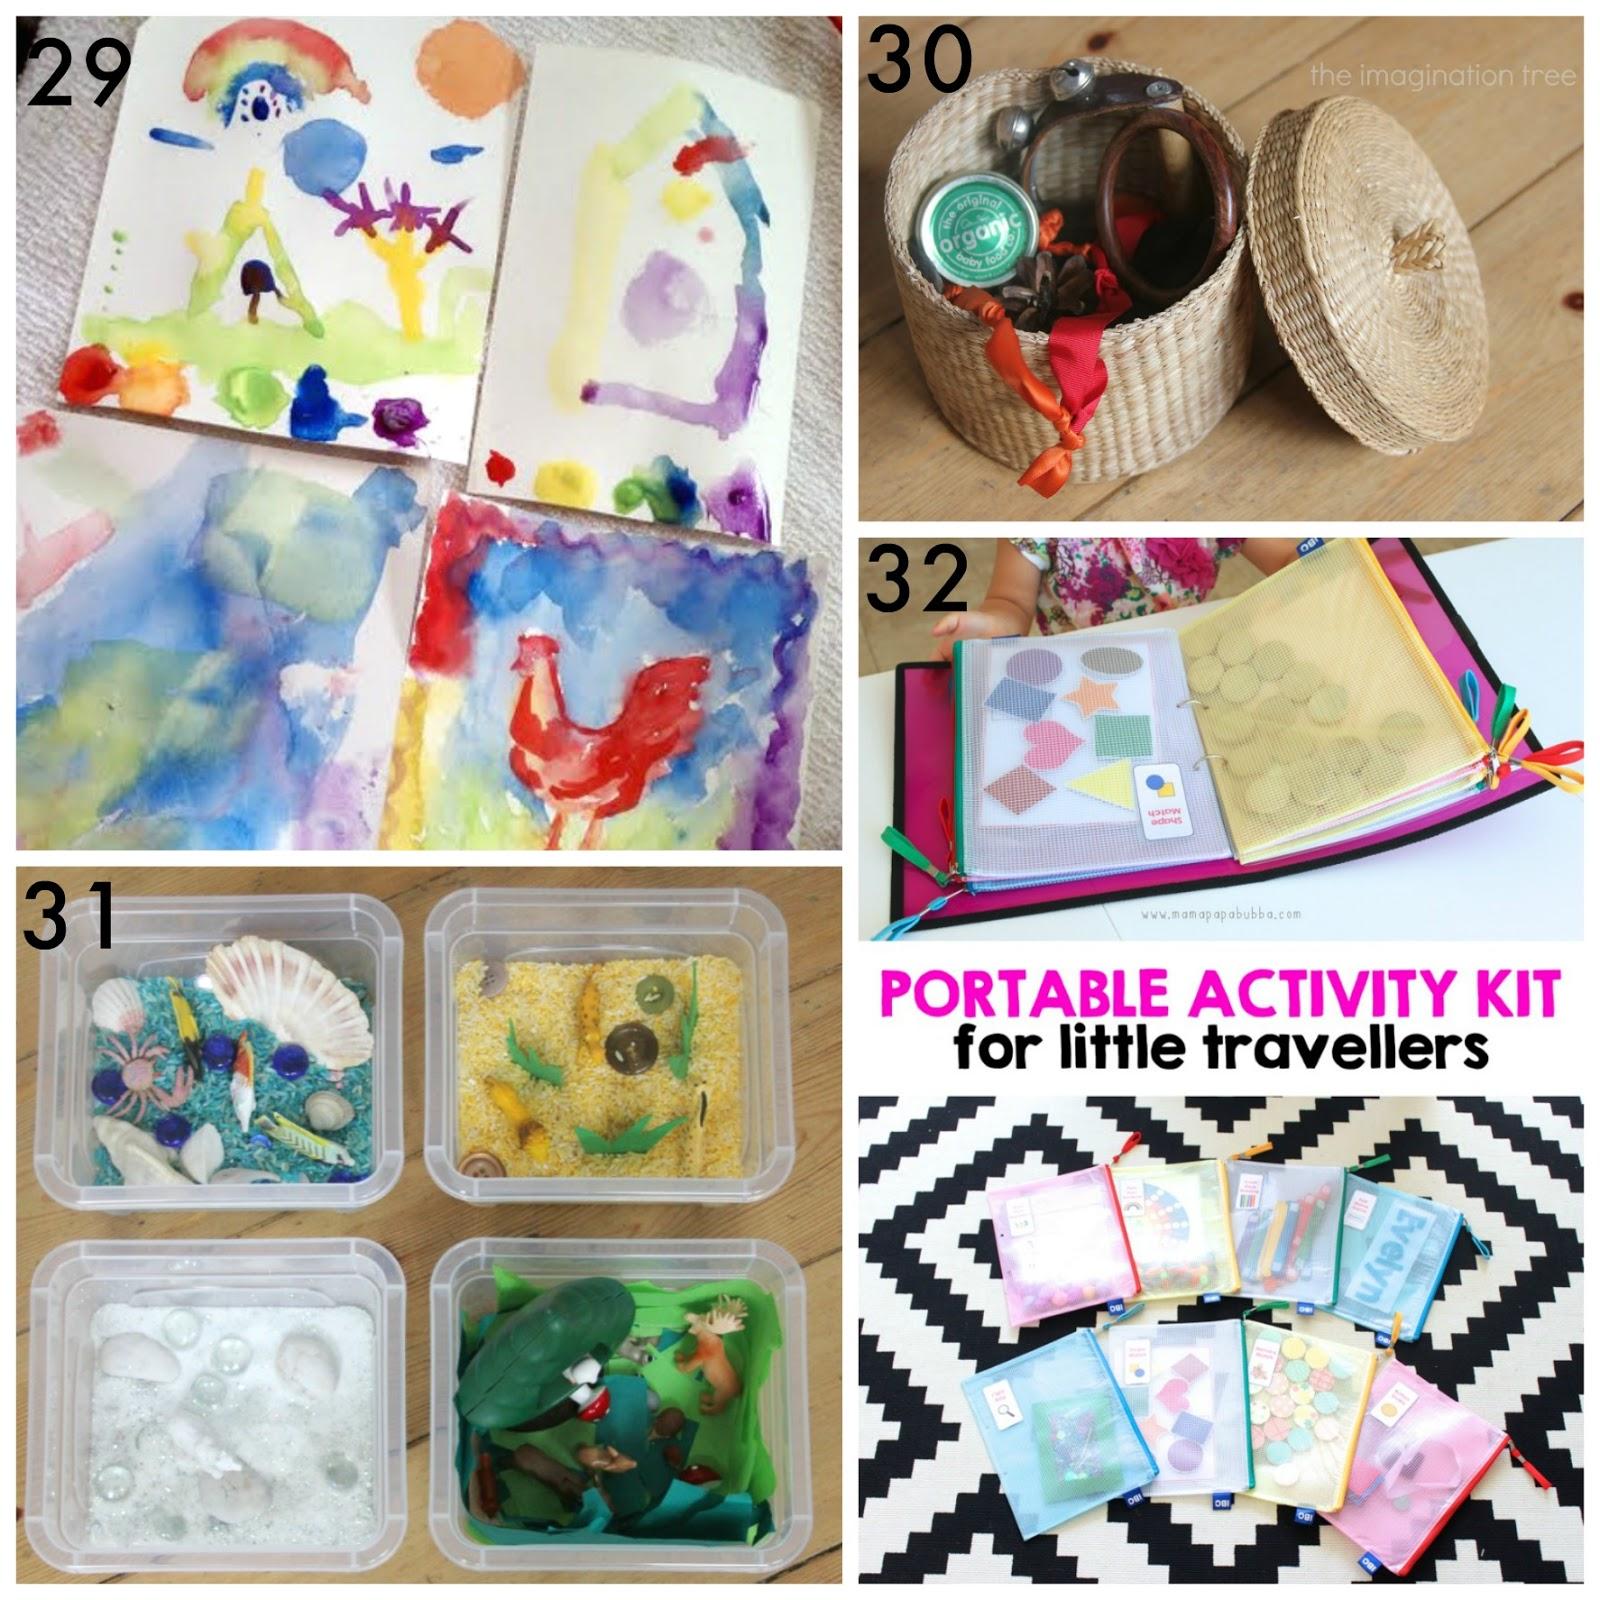 30+ DIY Portable Travel Kits for Entertaining Kids on the go!